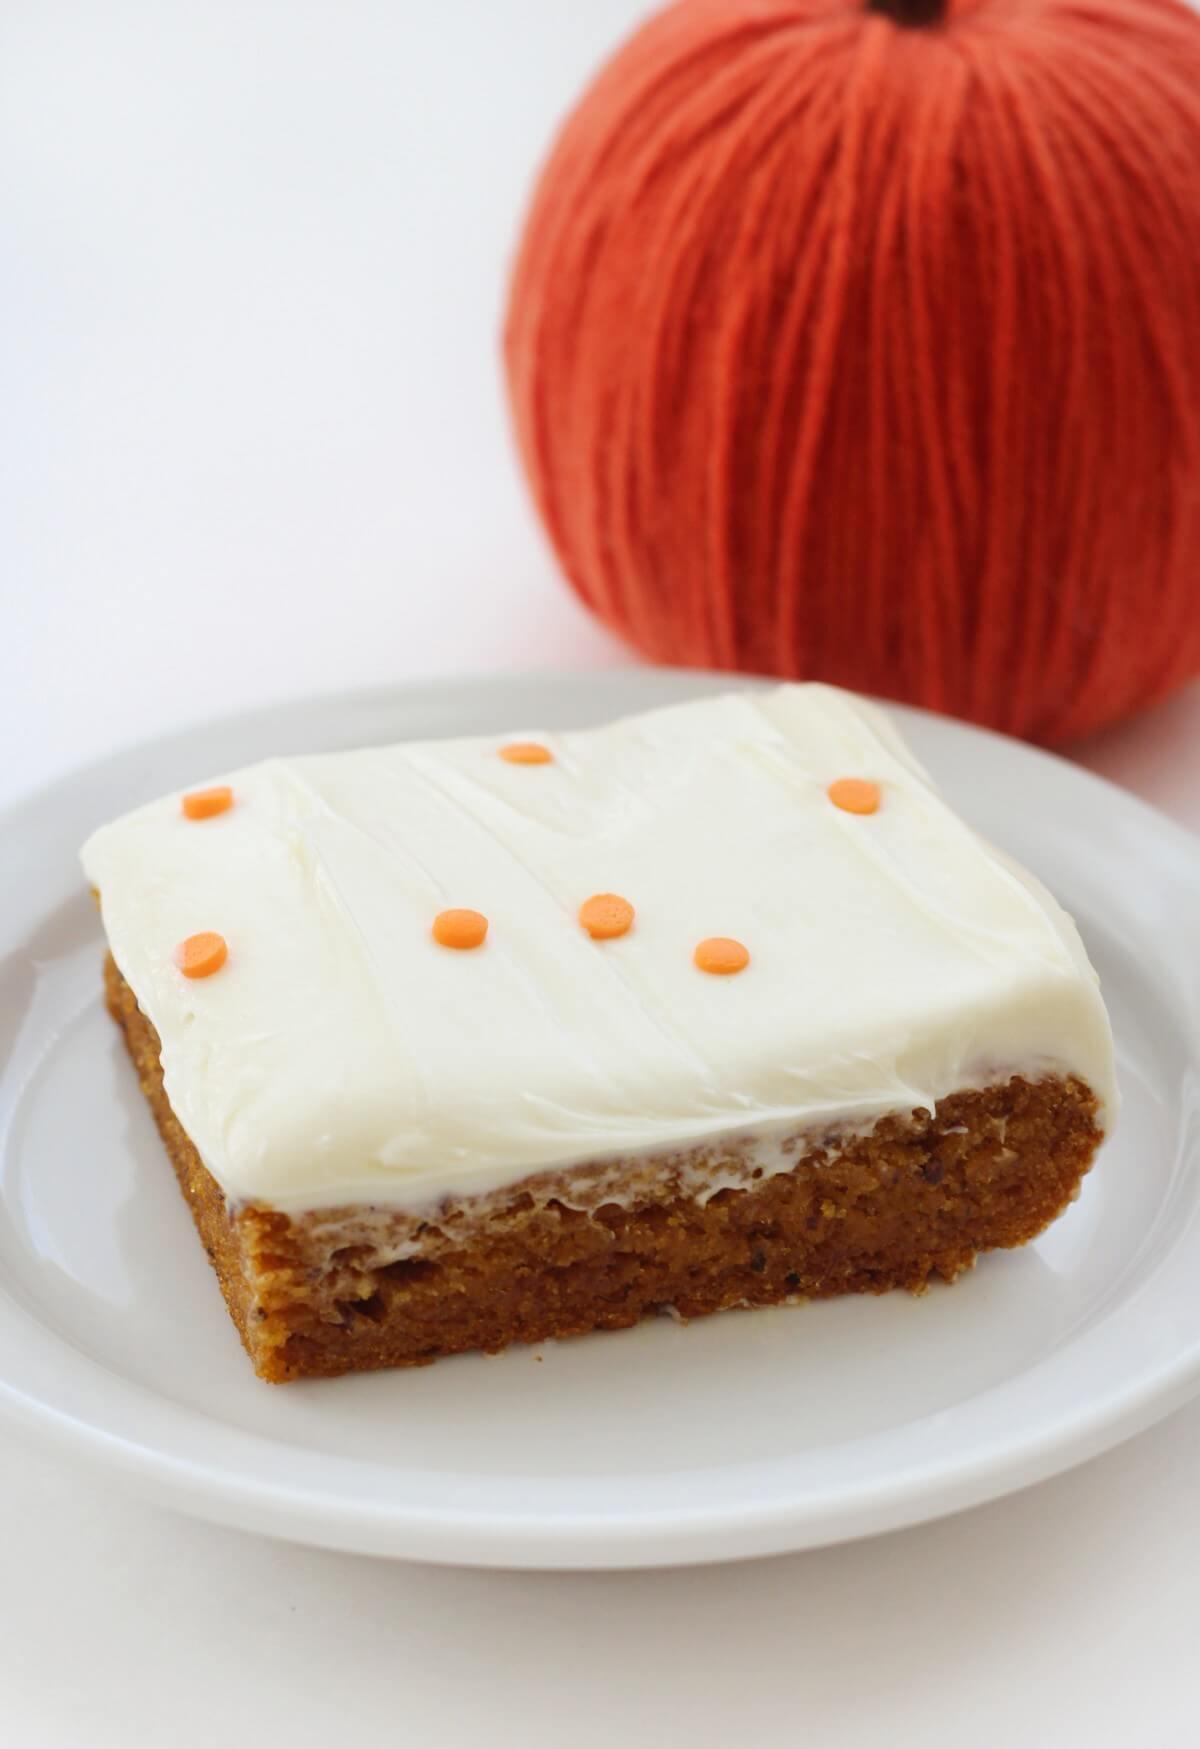 fresh slice of gluten-free pumpkin cake